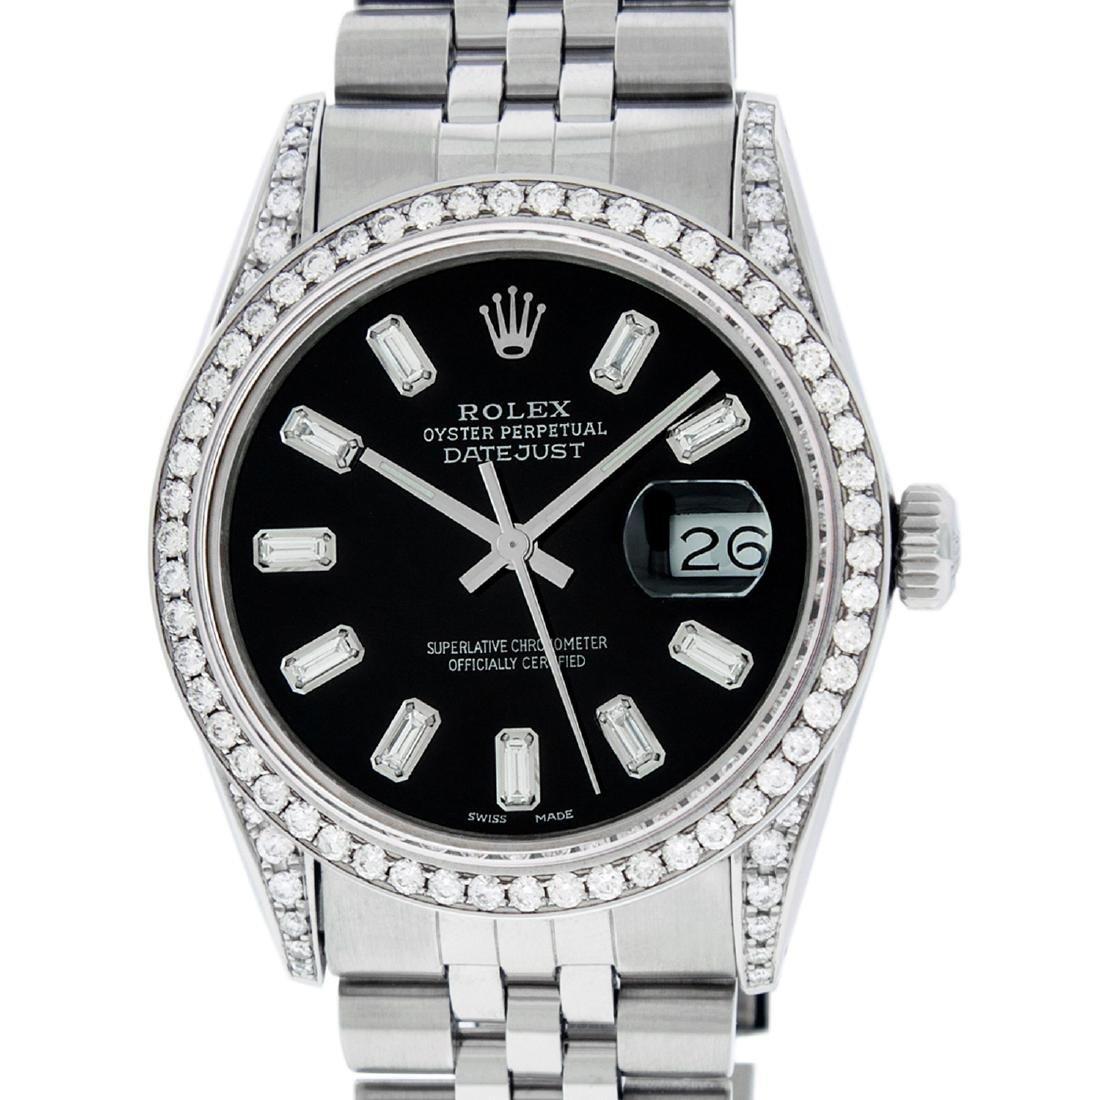 Rolex Mens Datejust Watch SS Black Baguette Diamond